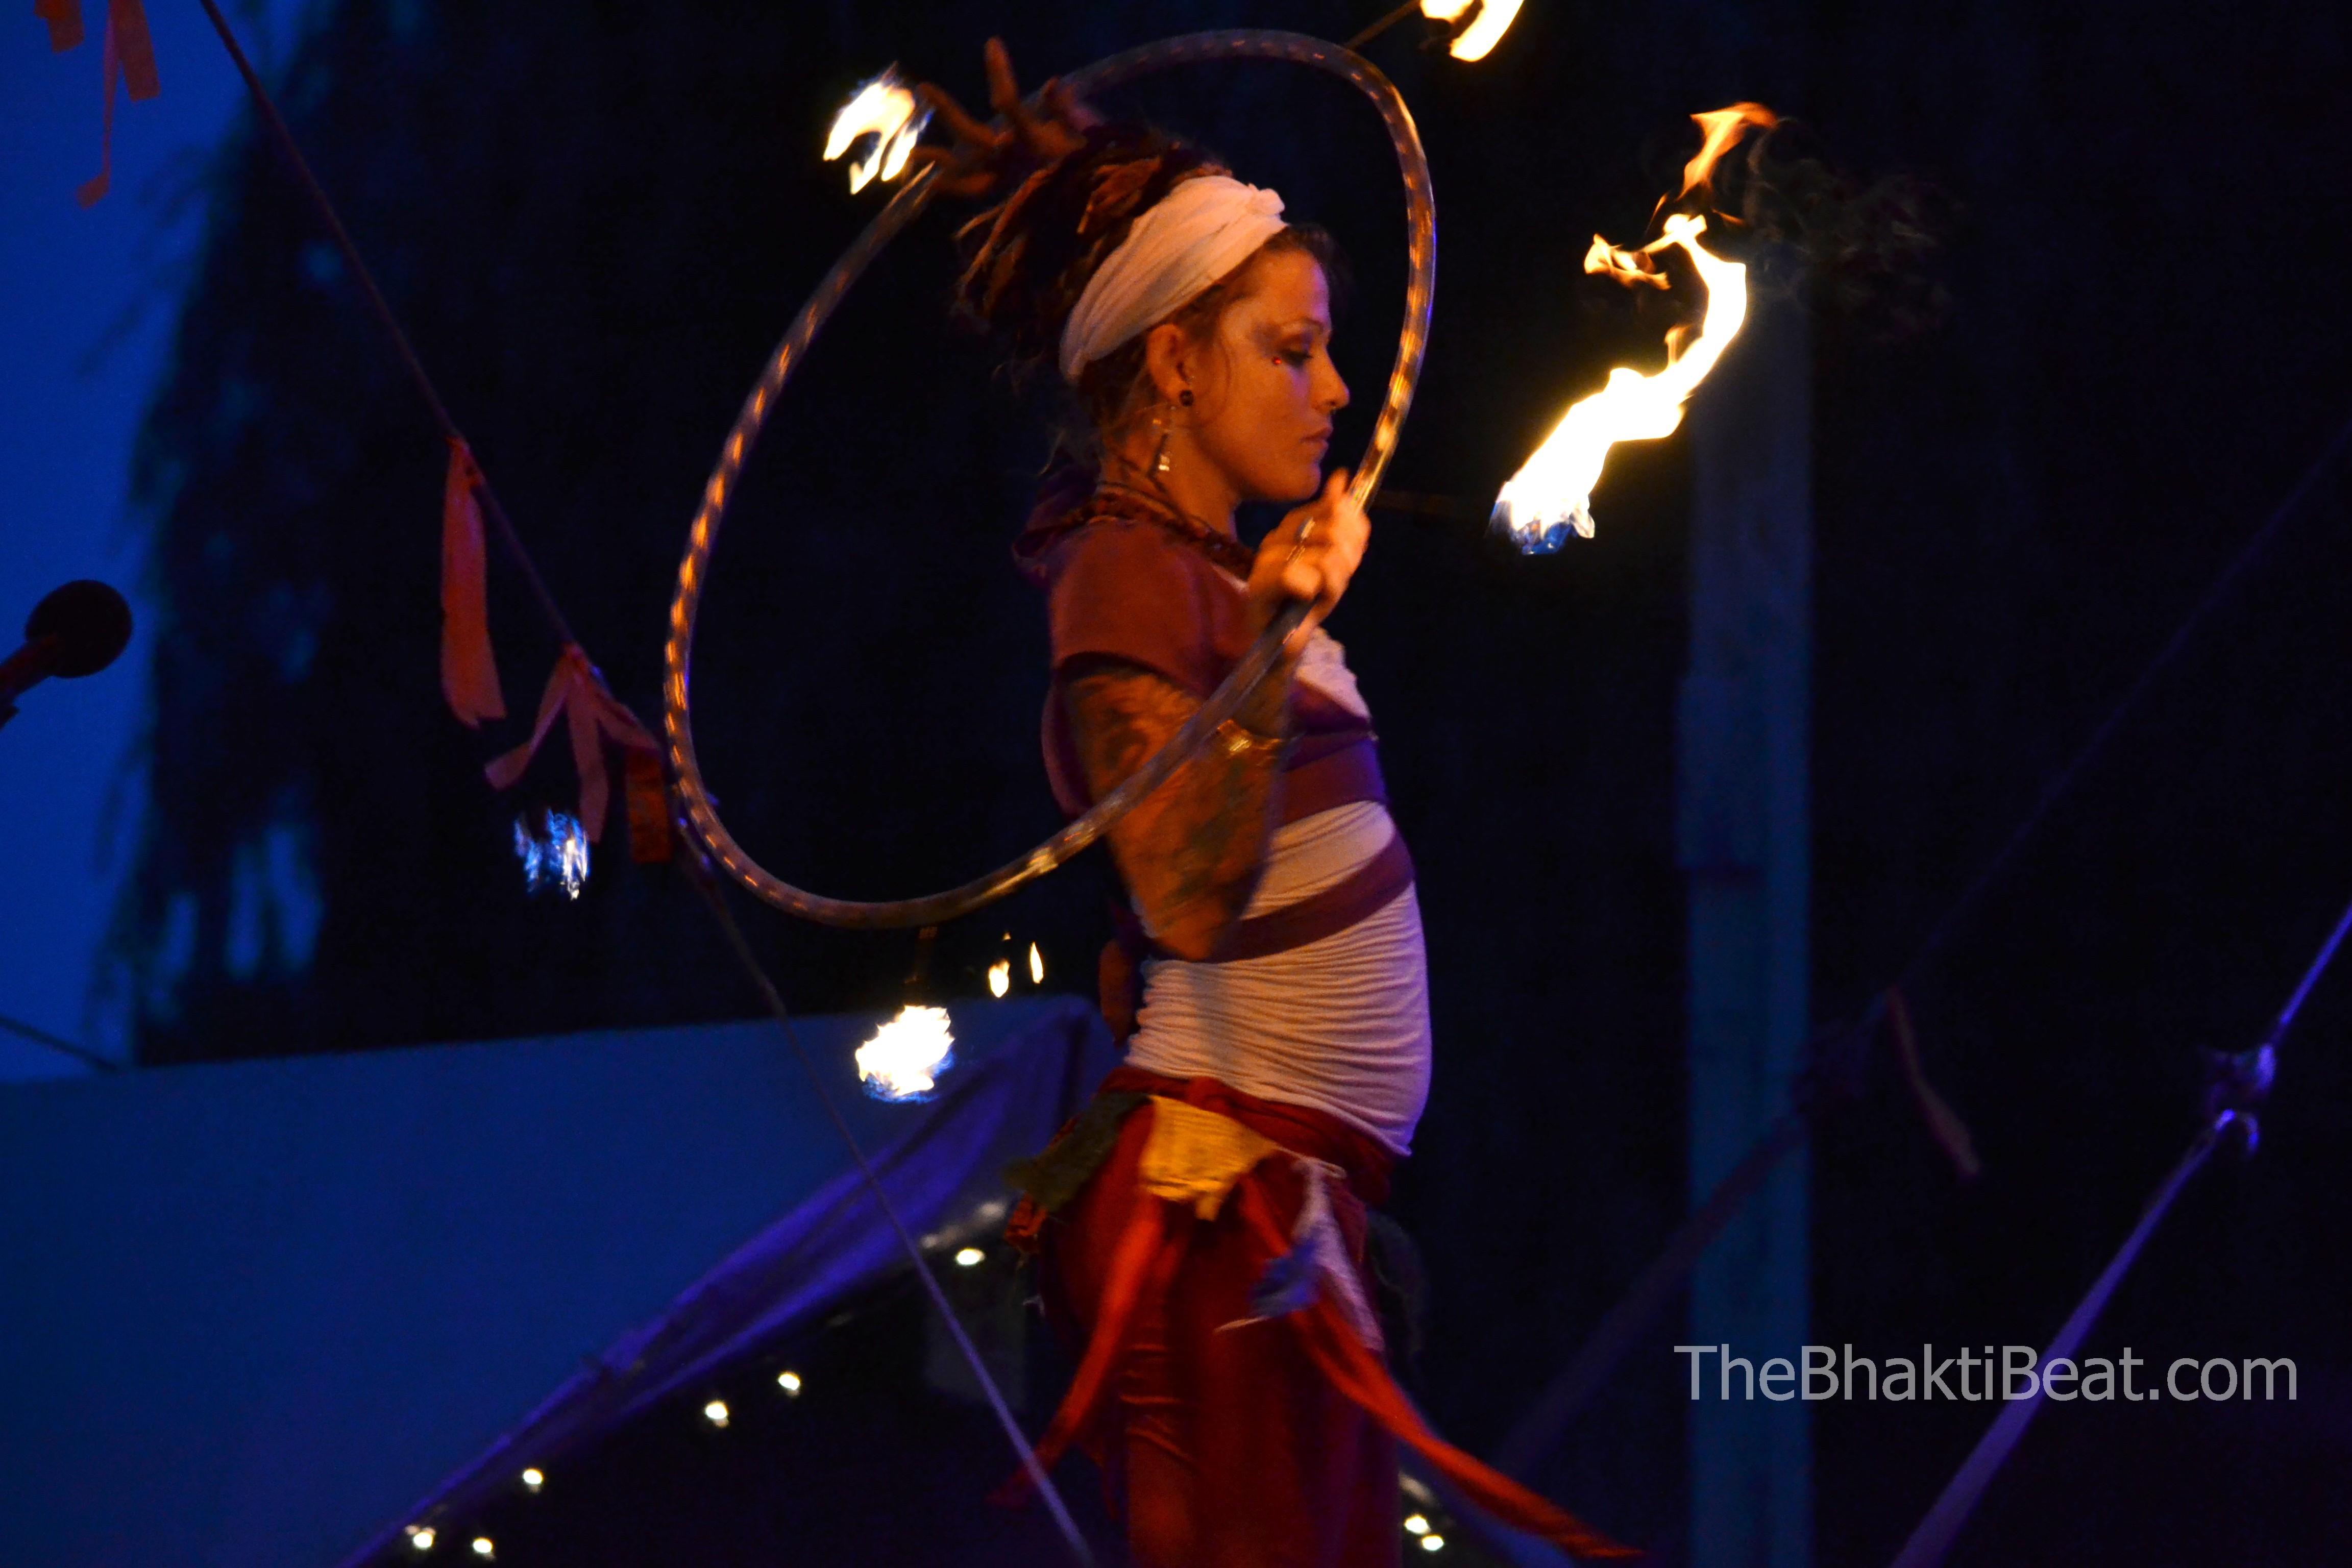 Firedancer at Bhakti Fest Midwest, by TheBhaktiBeat.com